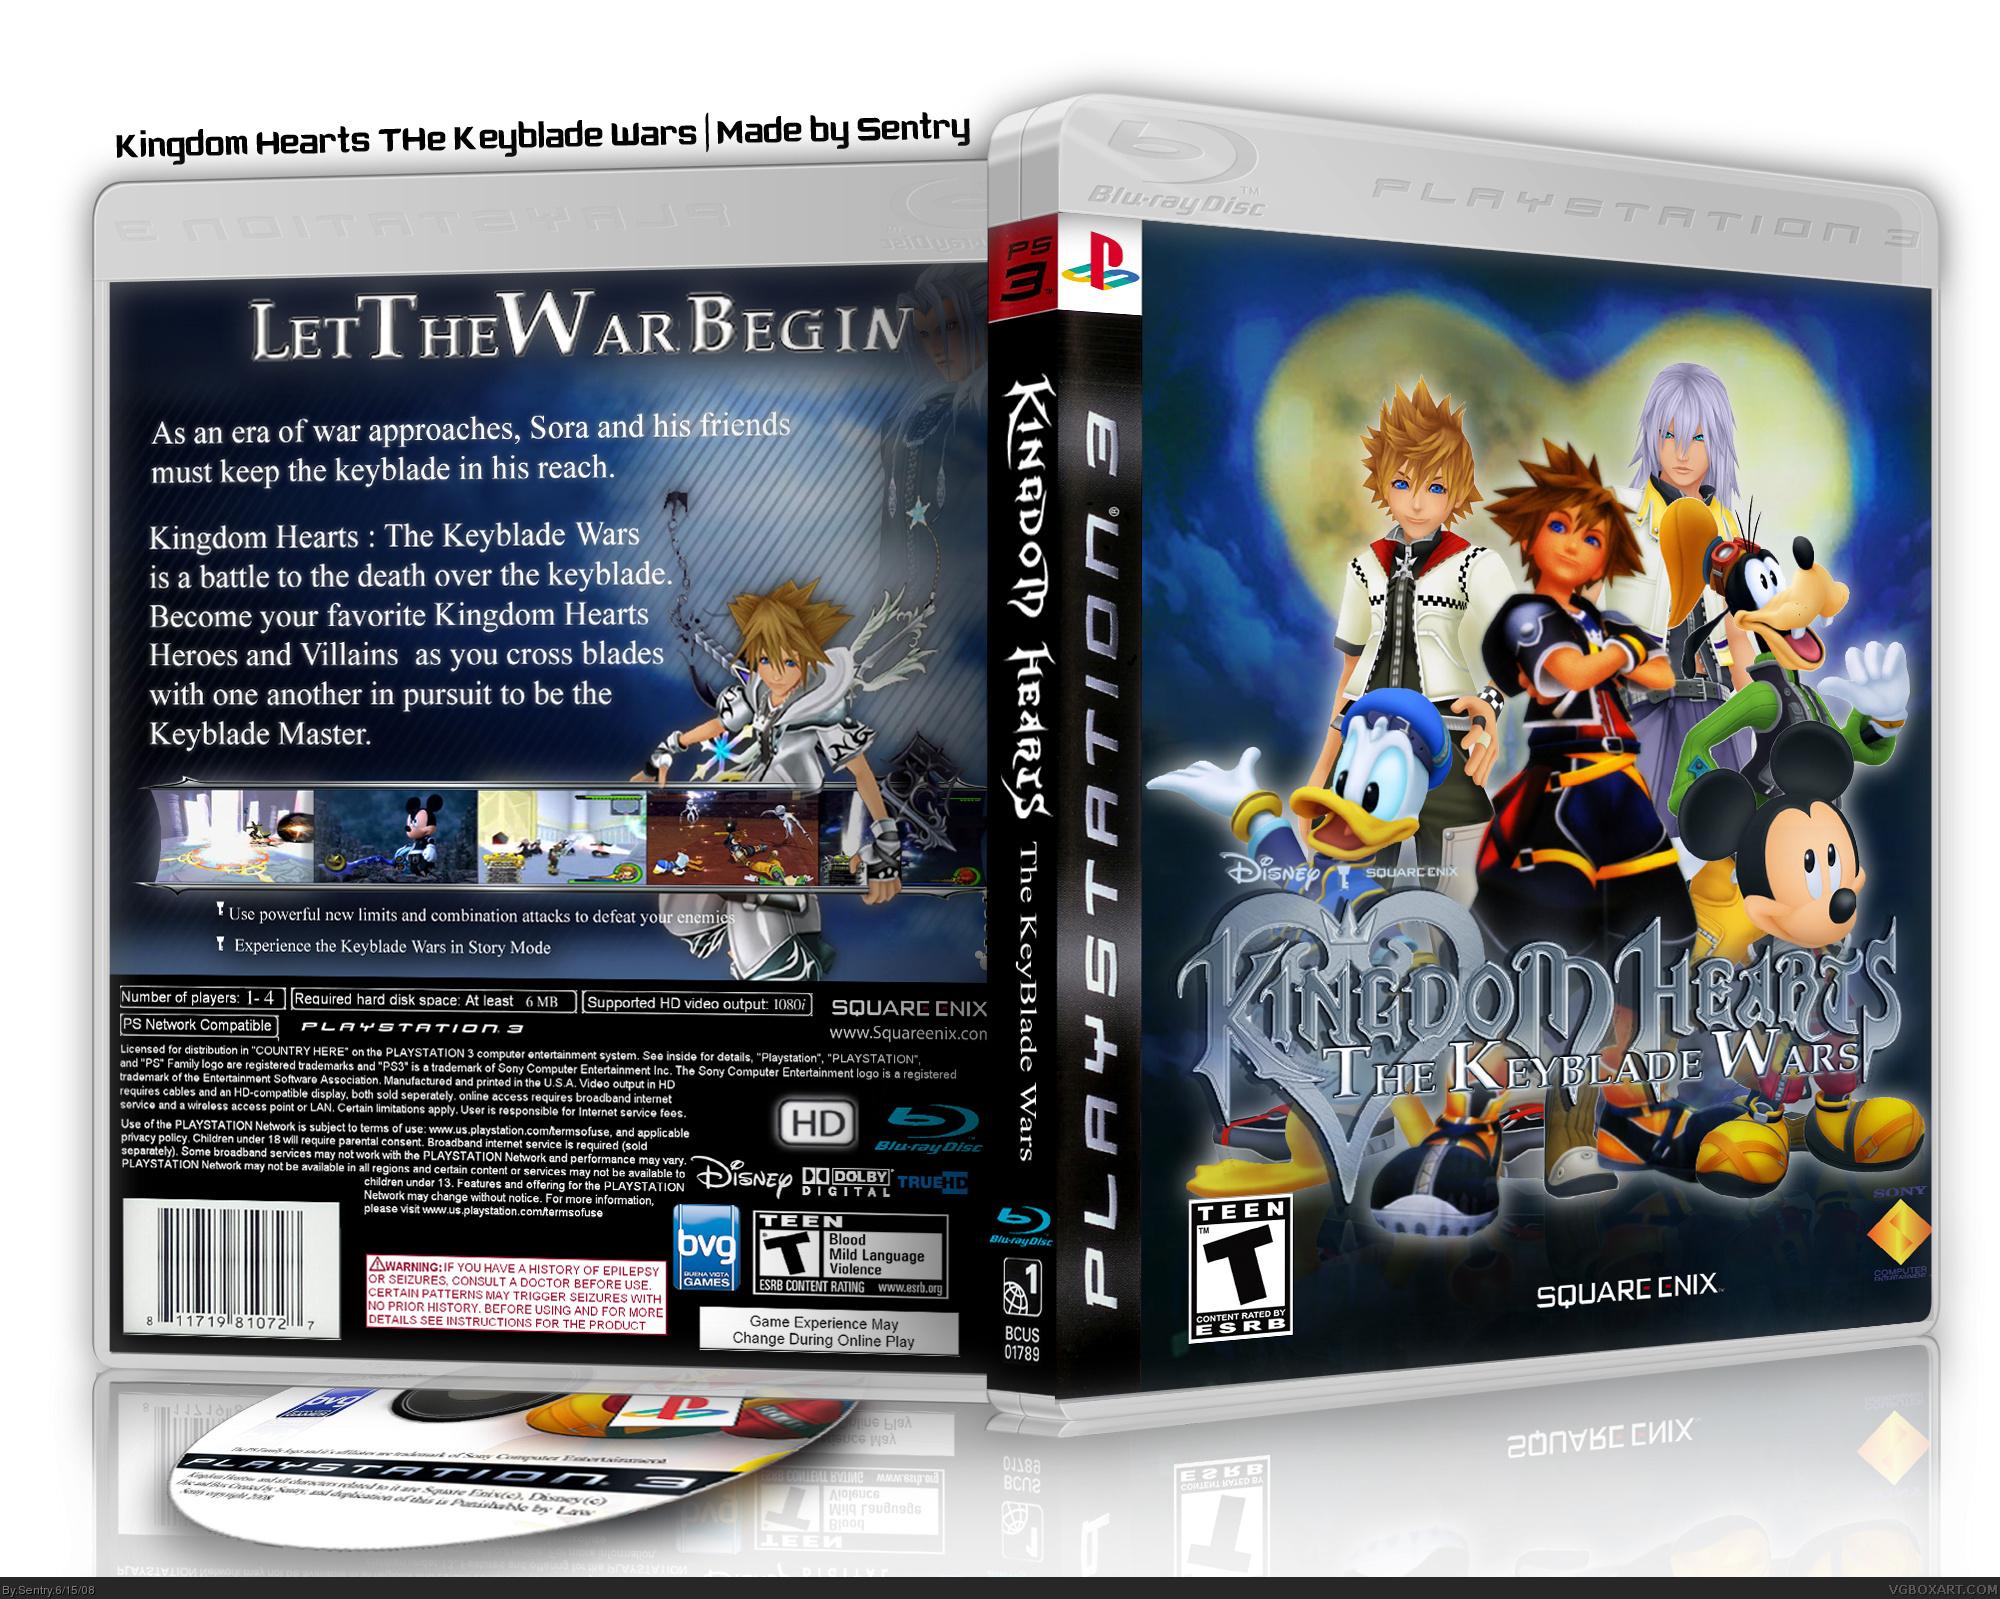 Kingdom Hearts The Keyblade Wars Playstation 3 Box Art